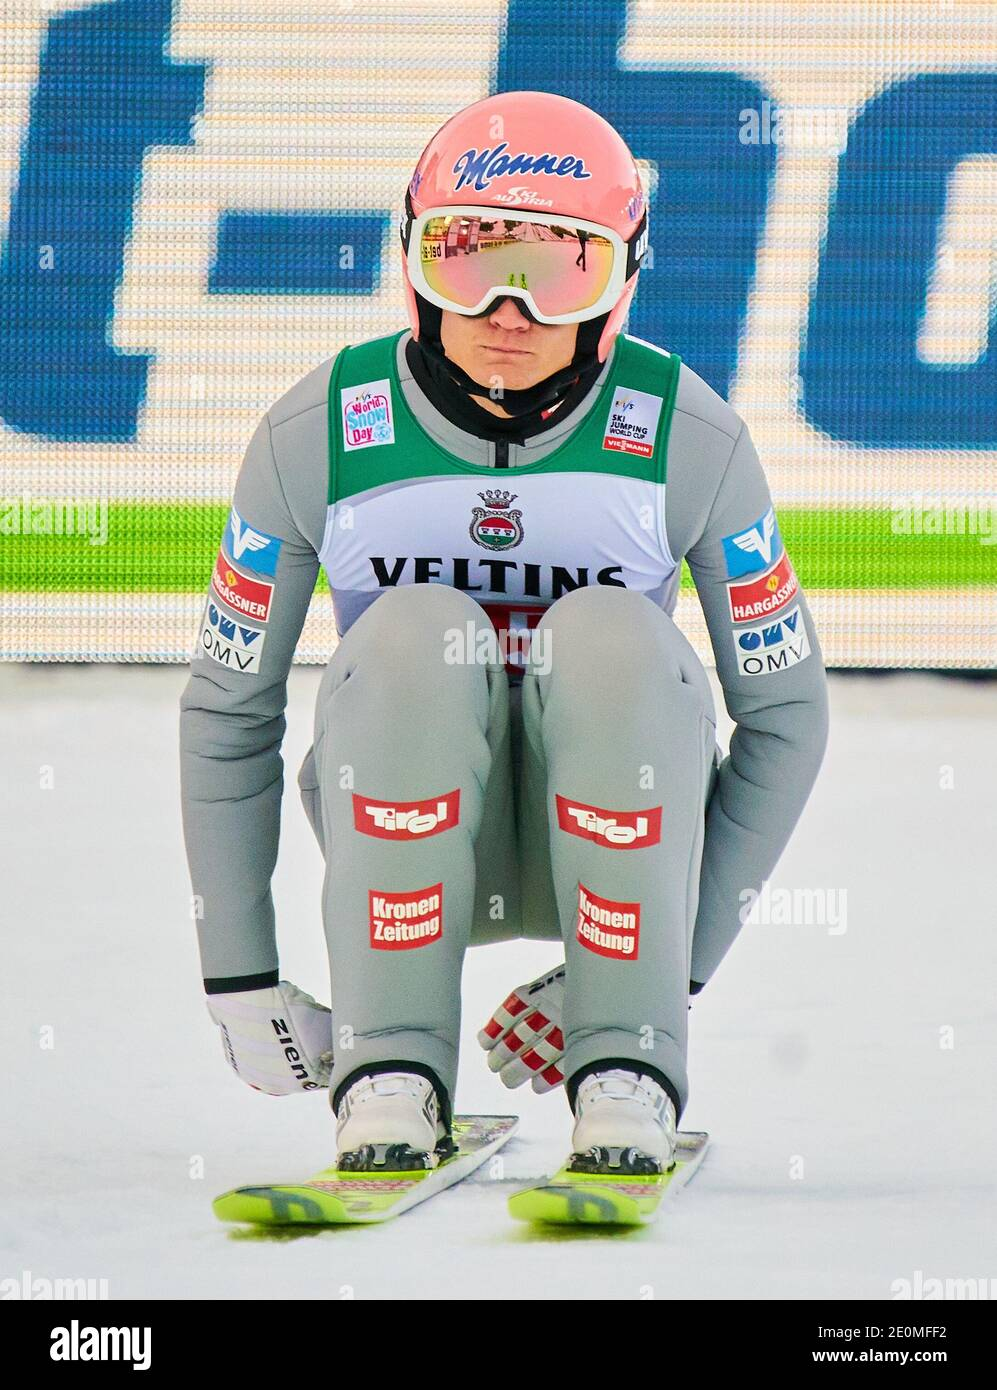 Daniel HUBER, AUT  in action at the Four Hills Tournament Ski Jumping at Olympic Stadium, Grosse Olympiaschanze in Garmisch-Partenkirchen, Bavaria, Germany, January 01, 2021.  © Peter Schatz / Alamy Live News Stock Photo